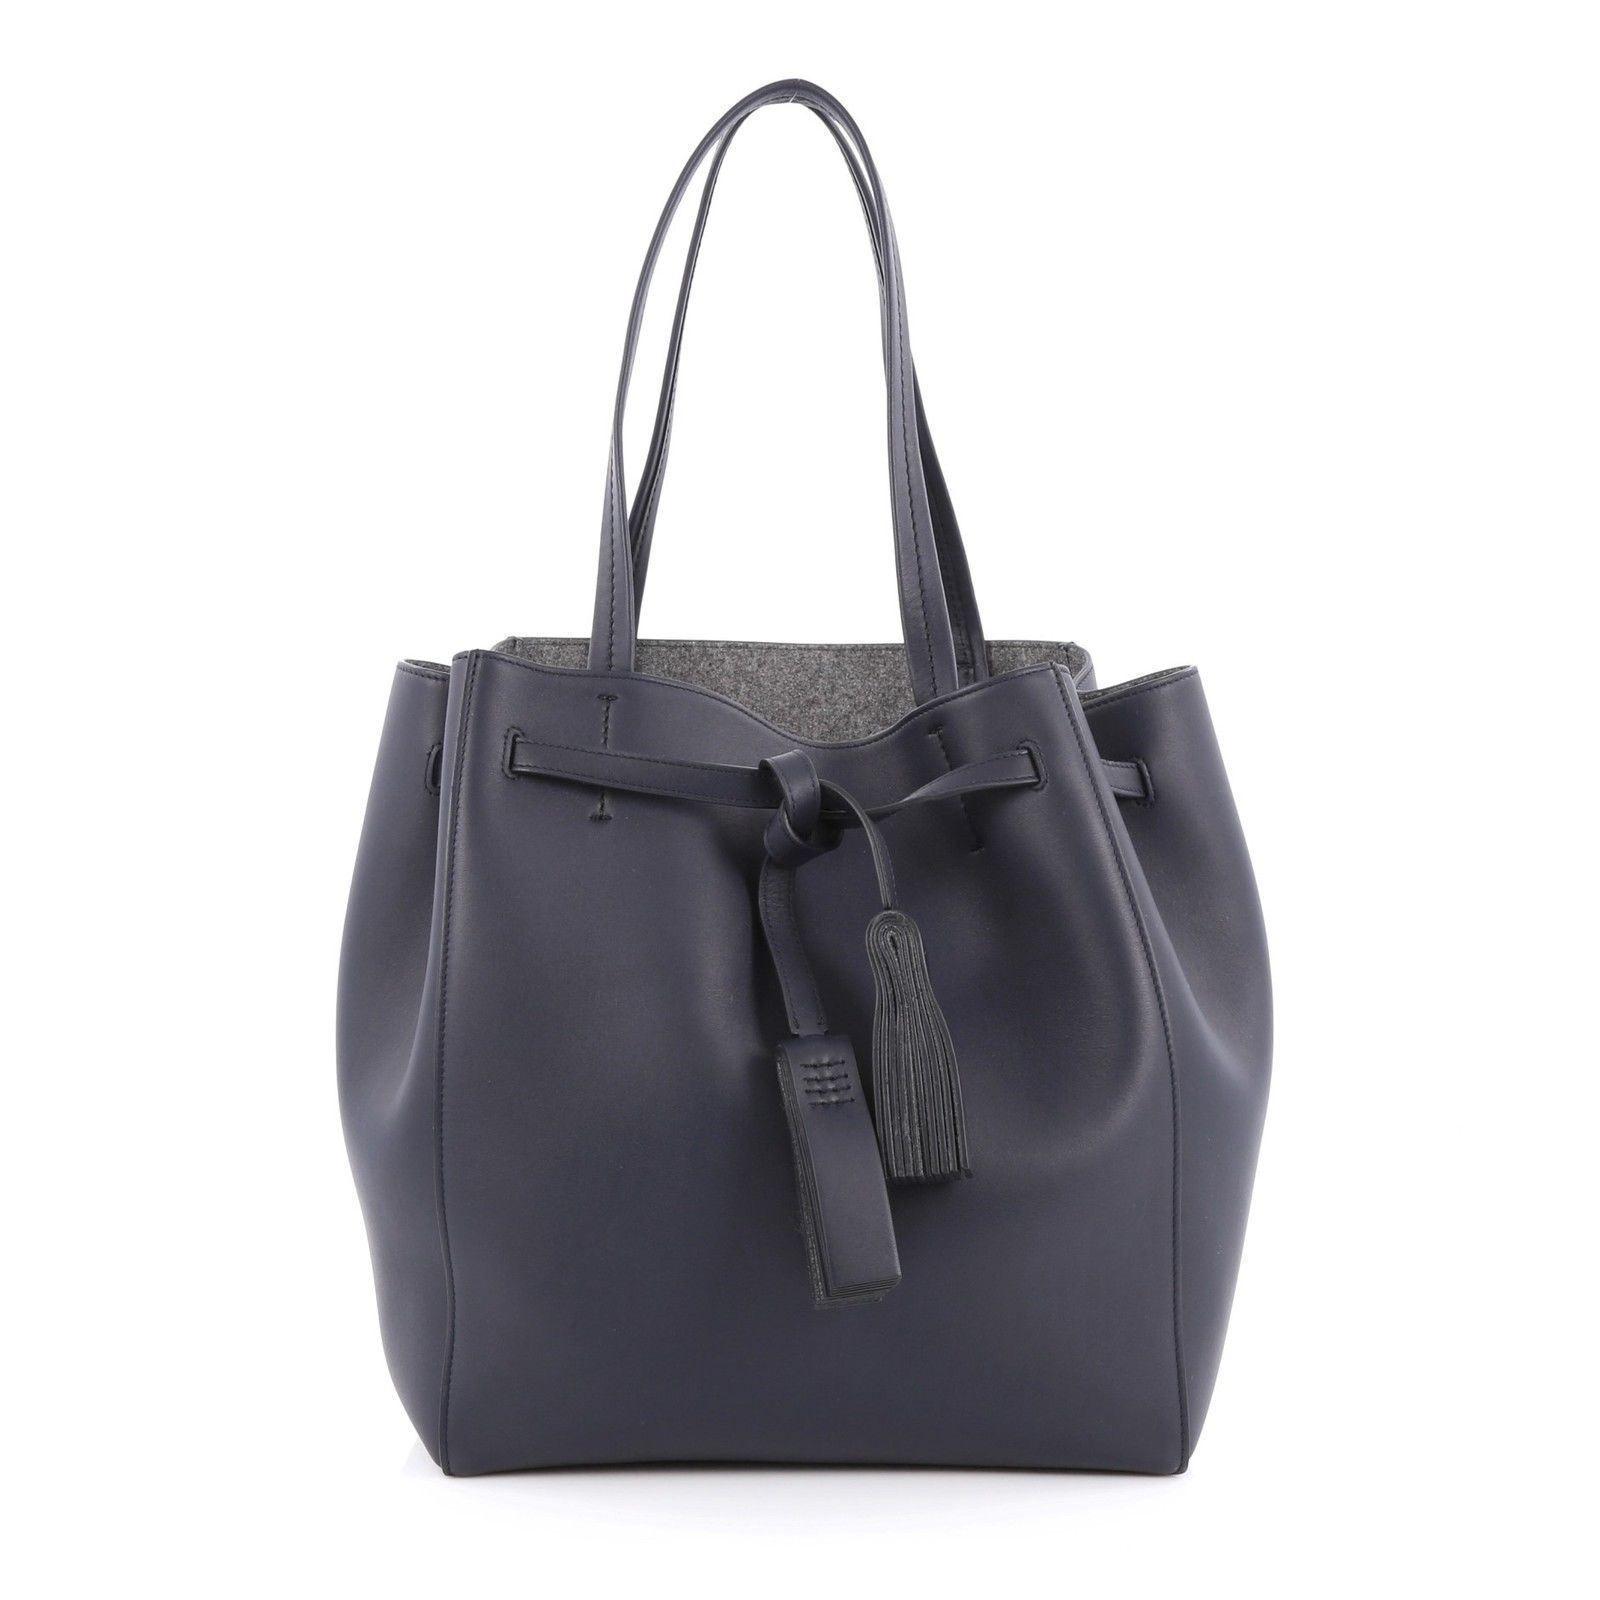 Celine Phantom In 2019 Handbags Purses